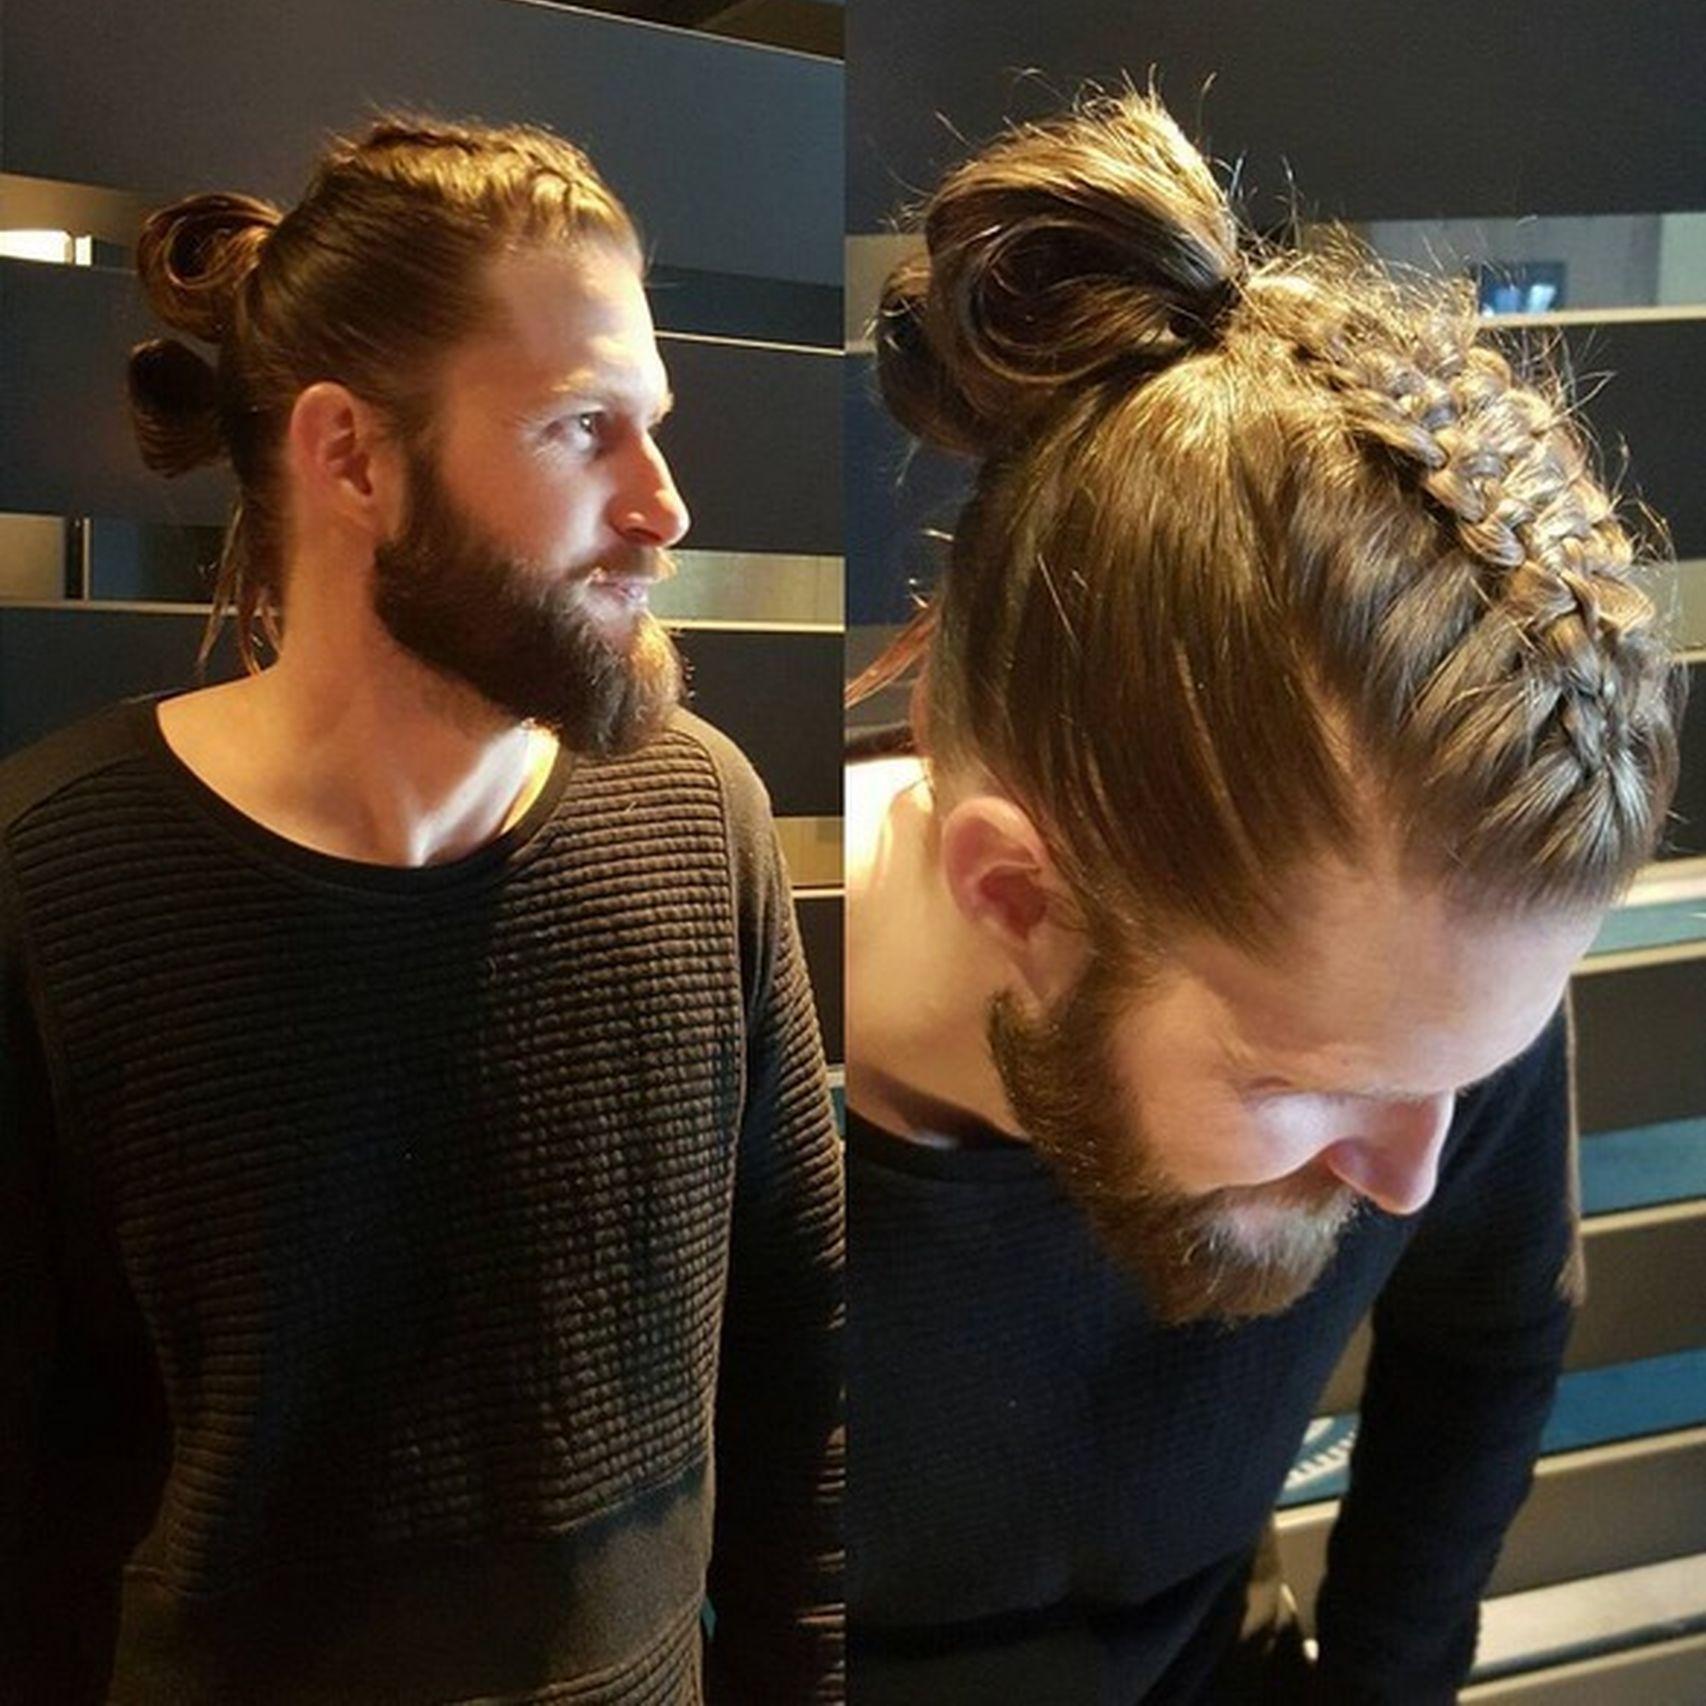 pin by riaz on hair | hair styles, mens braids hairstyles